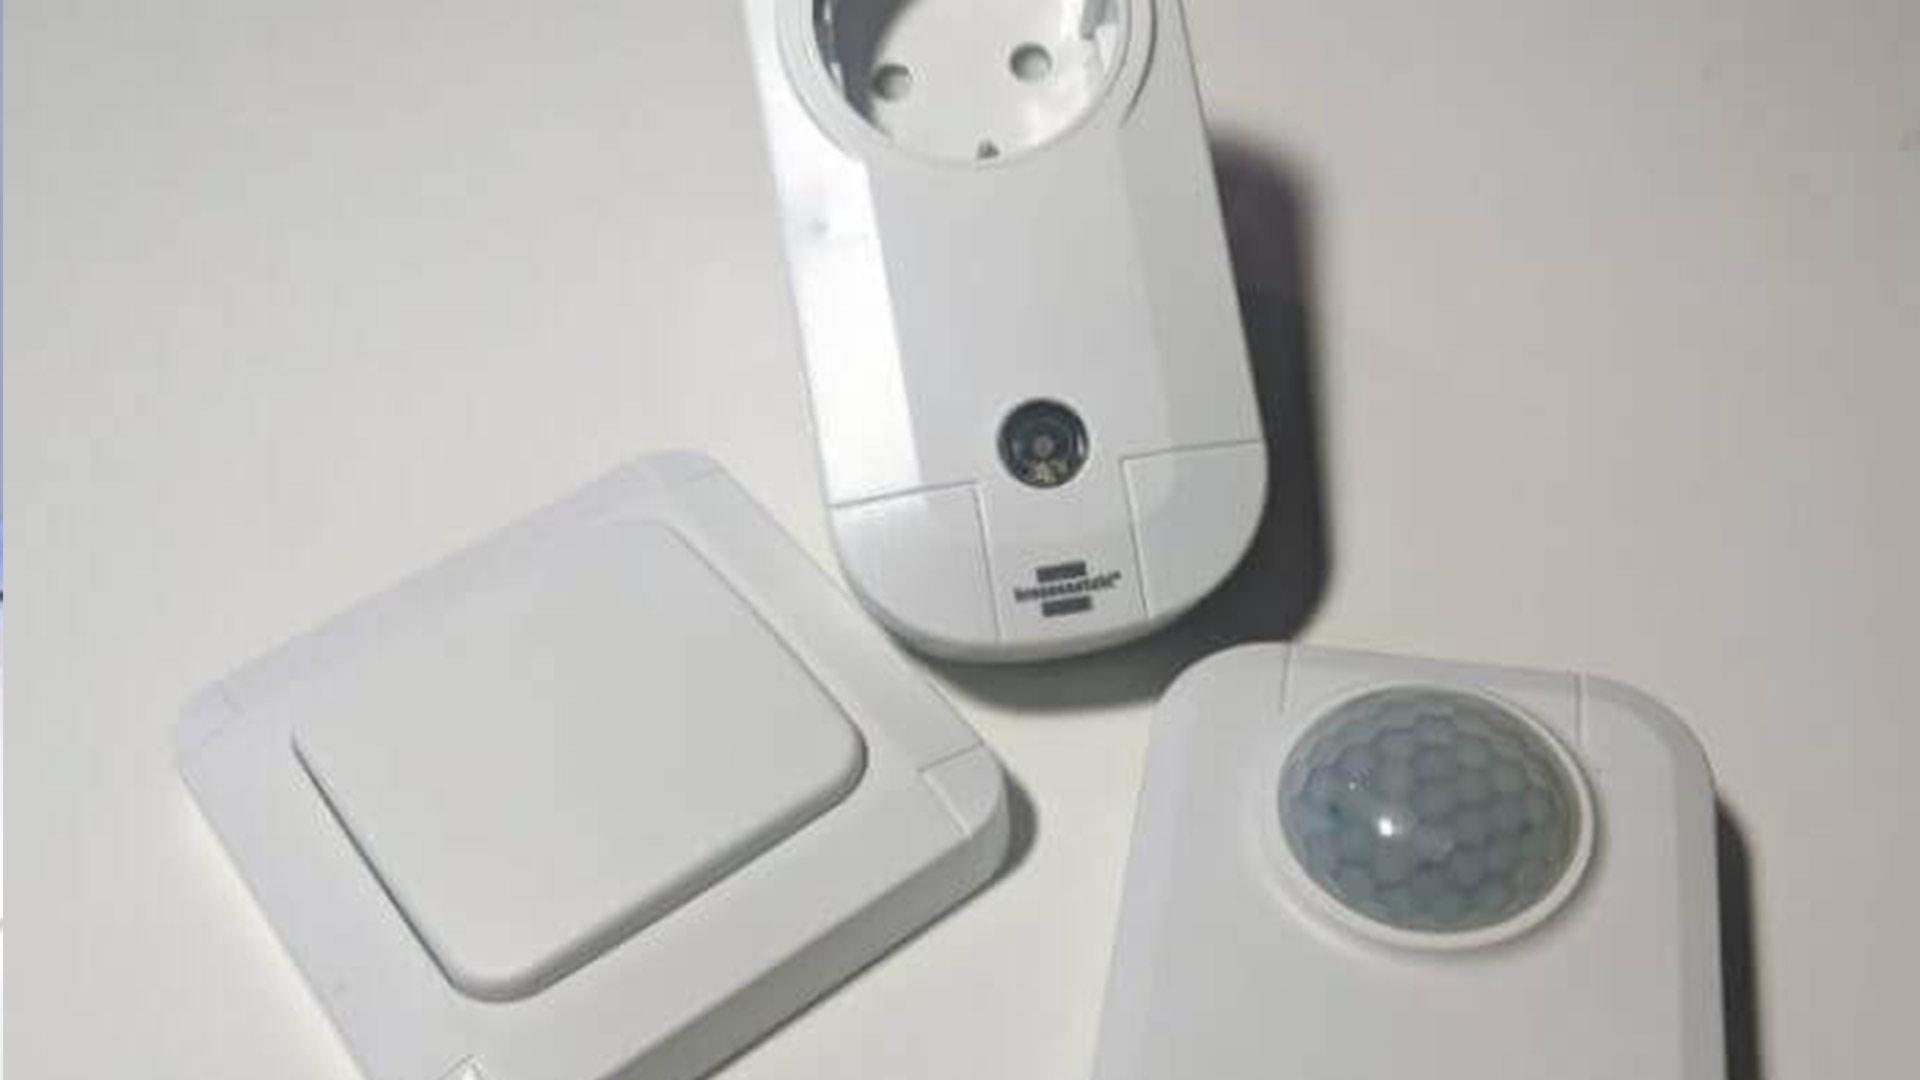 Brennenstuhl BrematicPRO Smart Home System